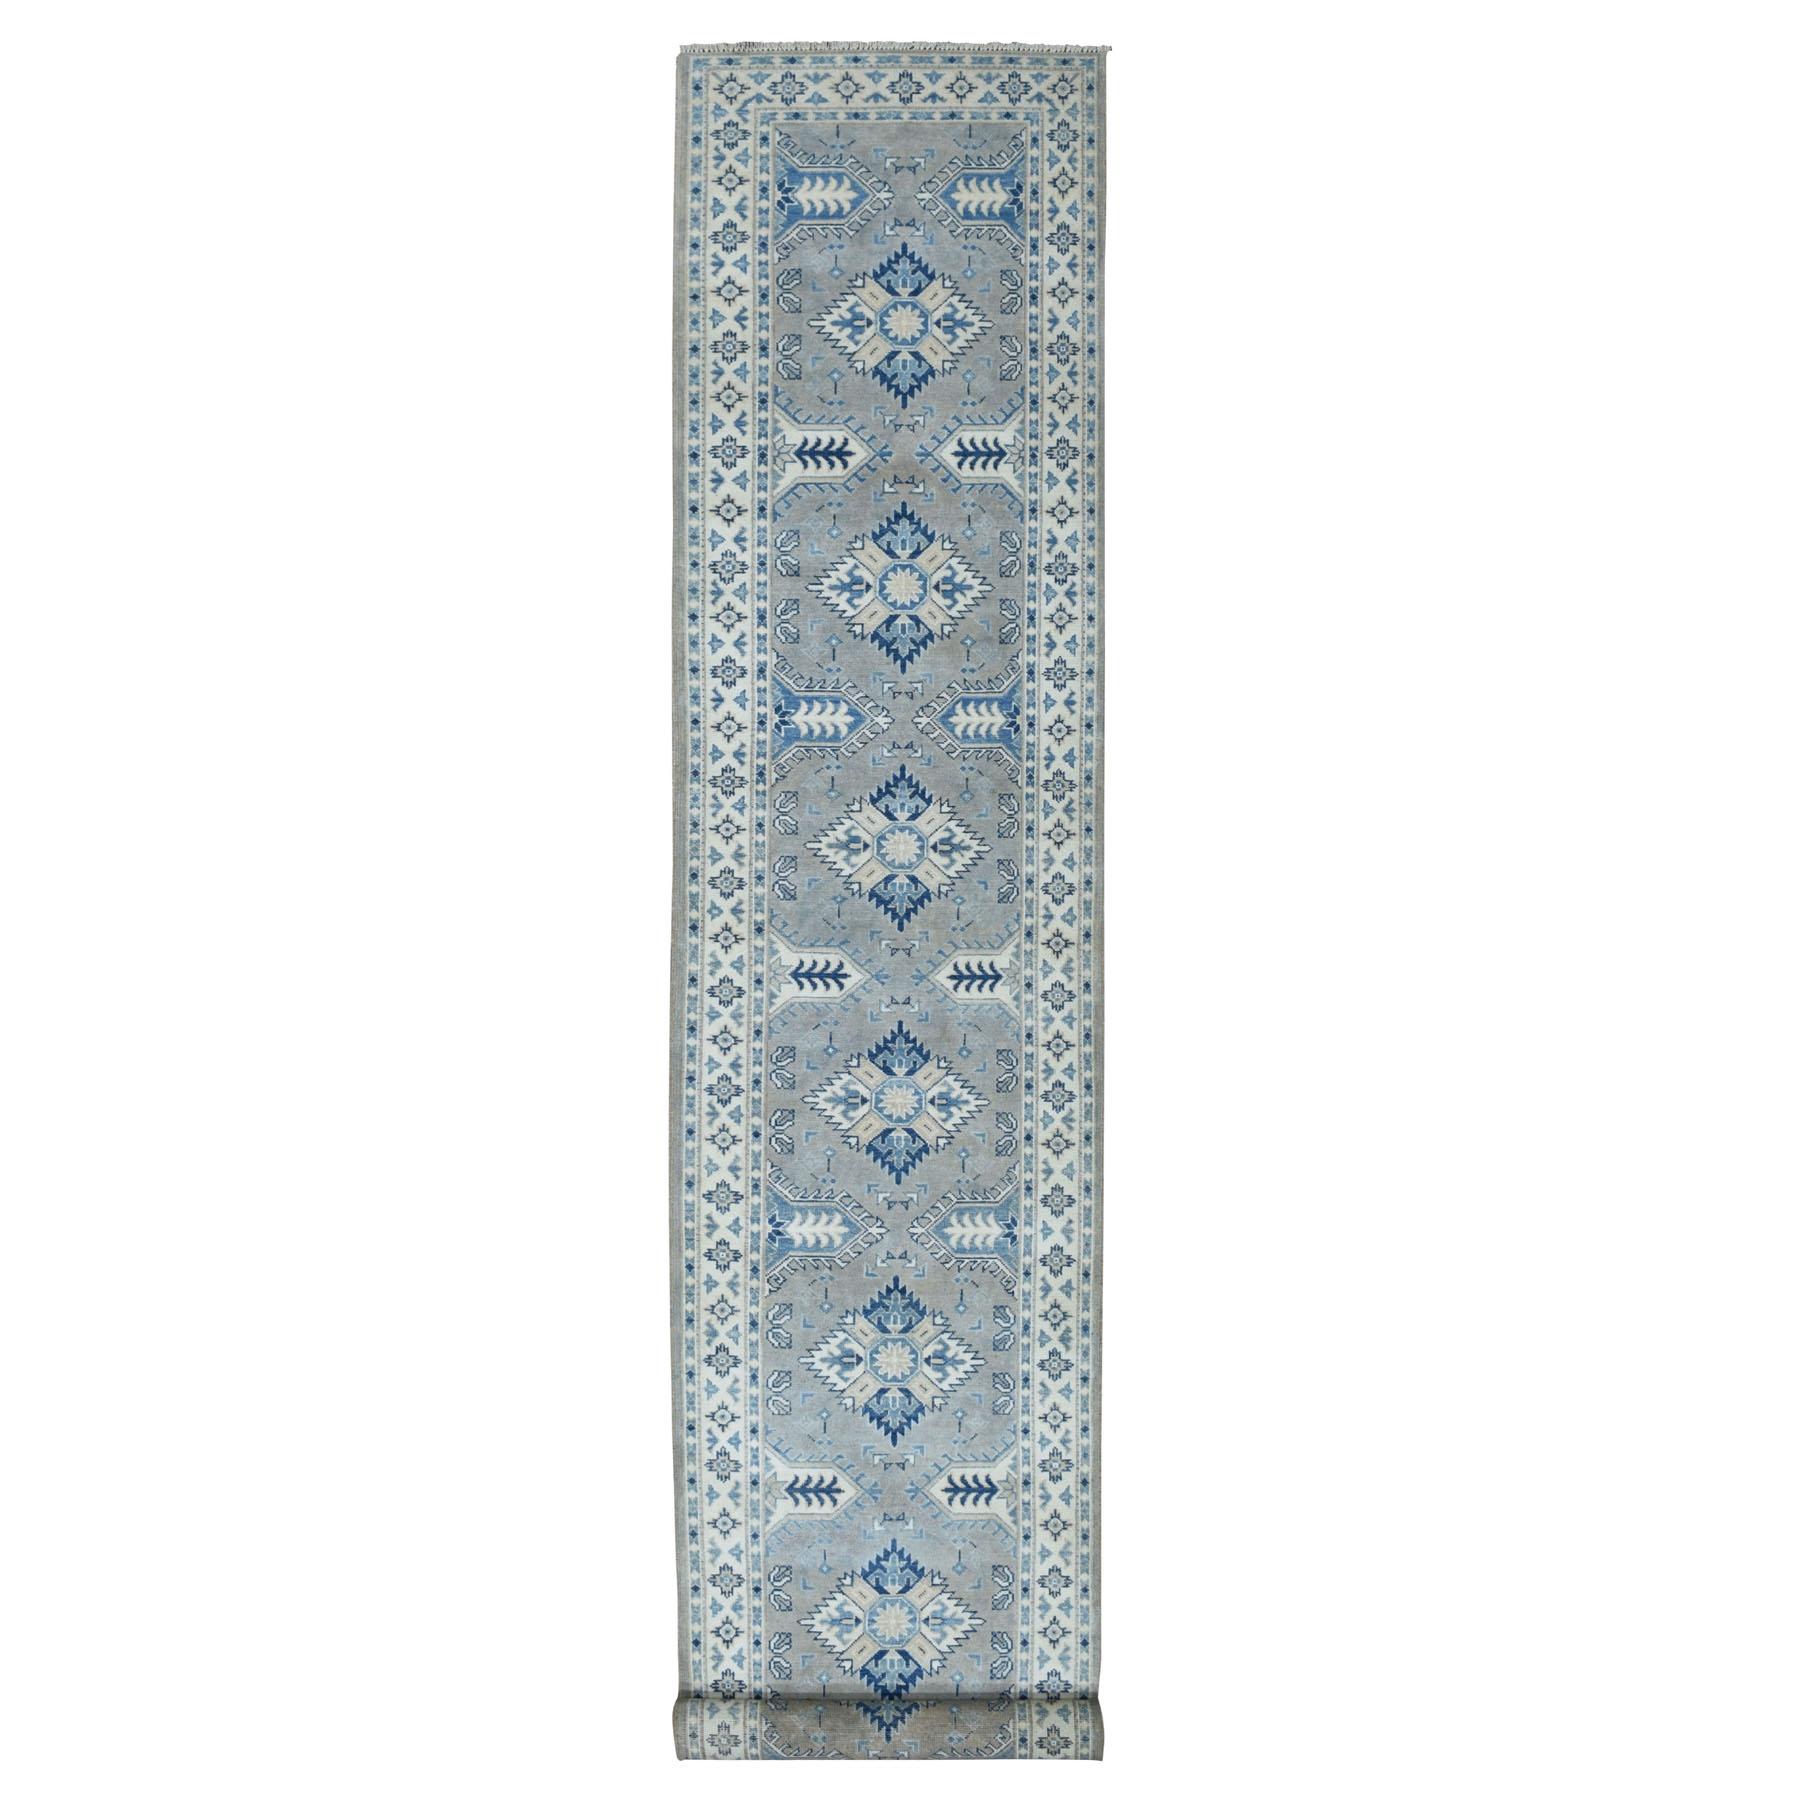 "2'8""x15'7"" Gray Vintage Look Kazak Geometric Design Runner Pure Wool Hand Knotted Oriental Rug 52013"